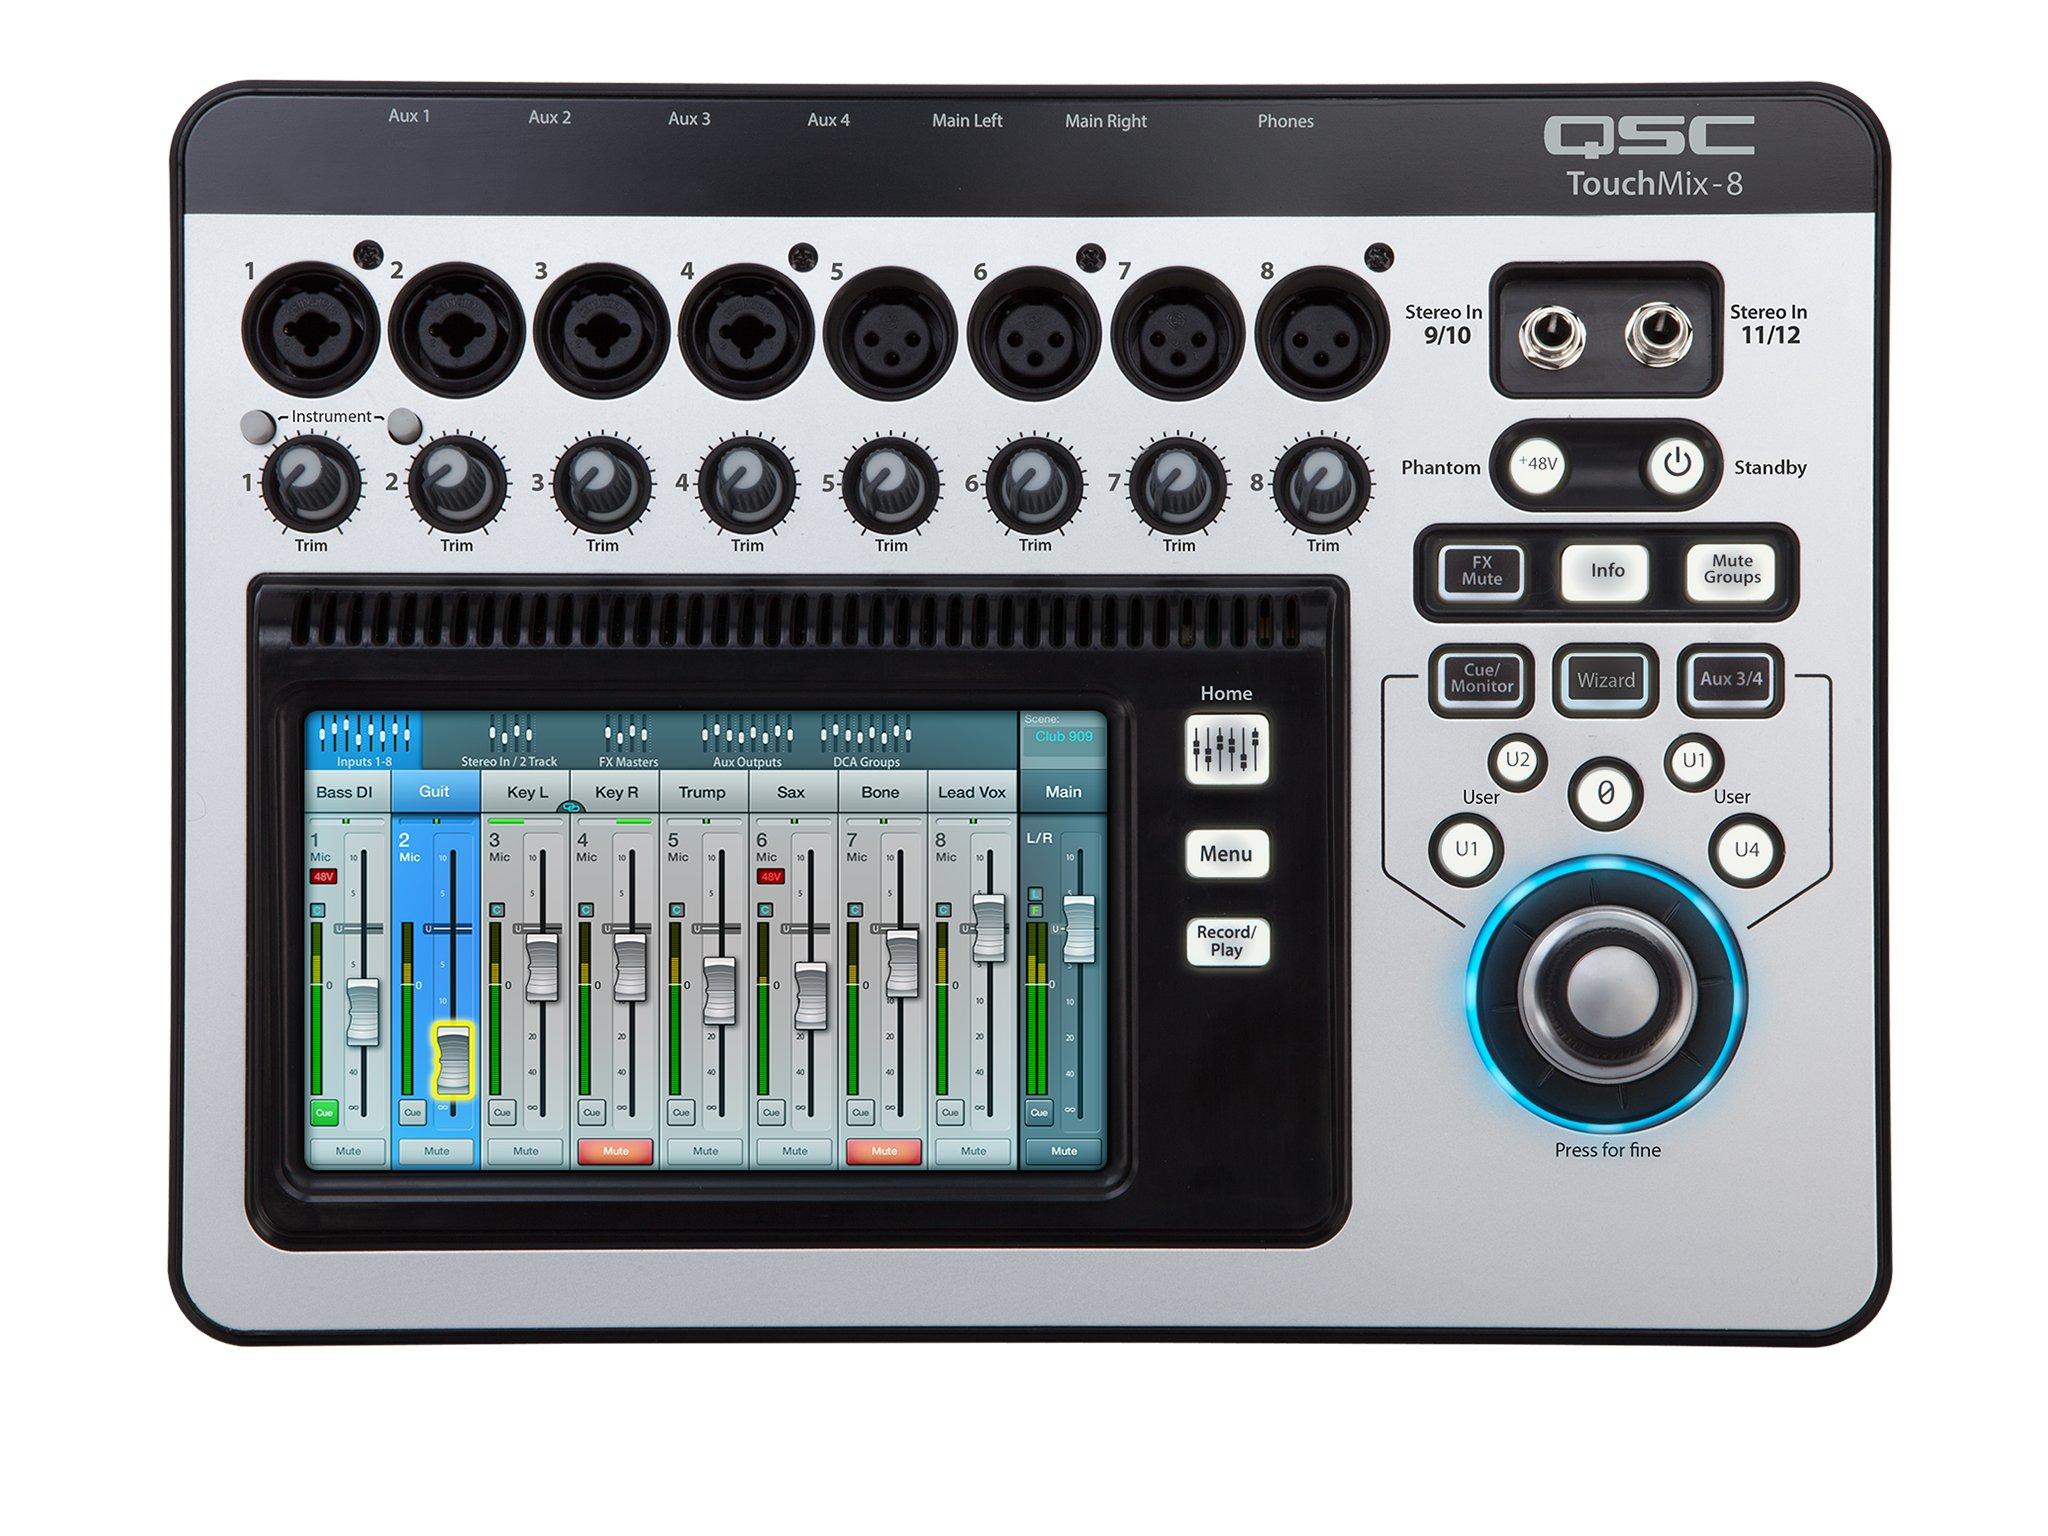 QSC TouchMix Compact Digital Mixer with Bag